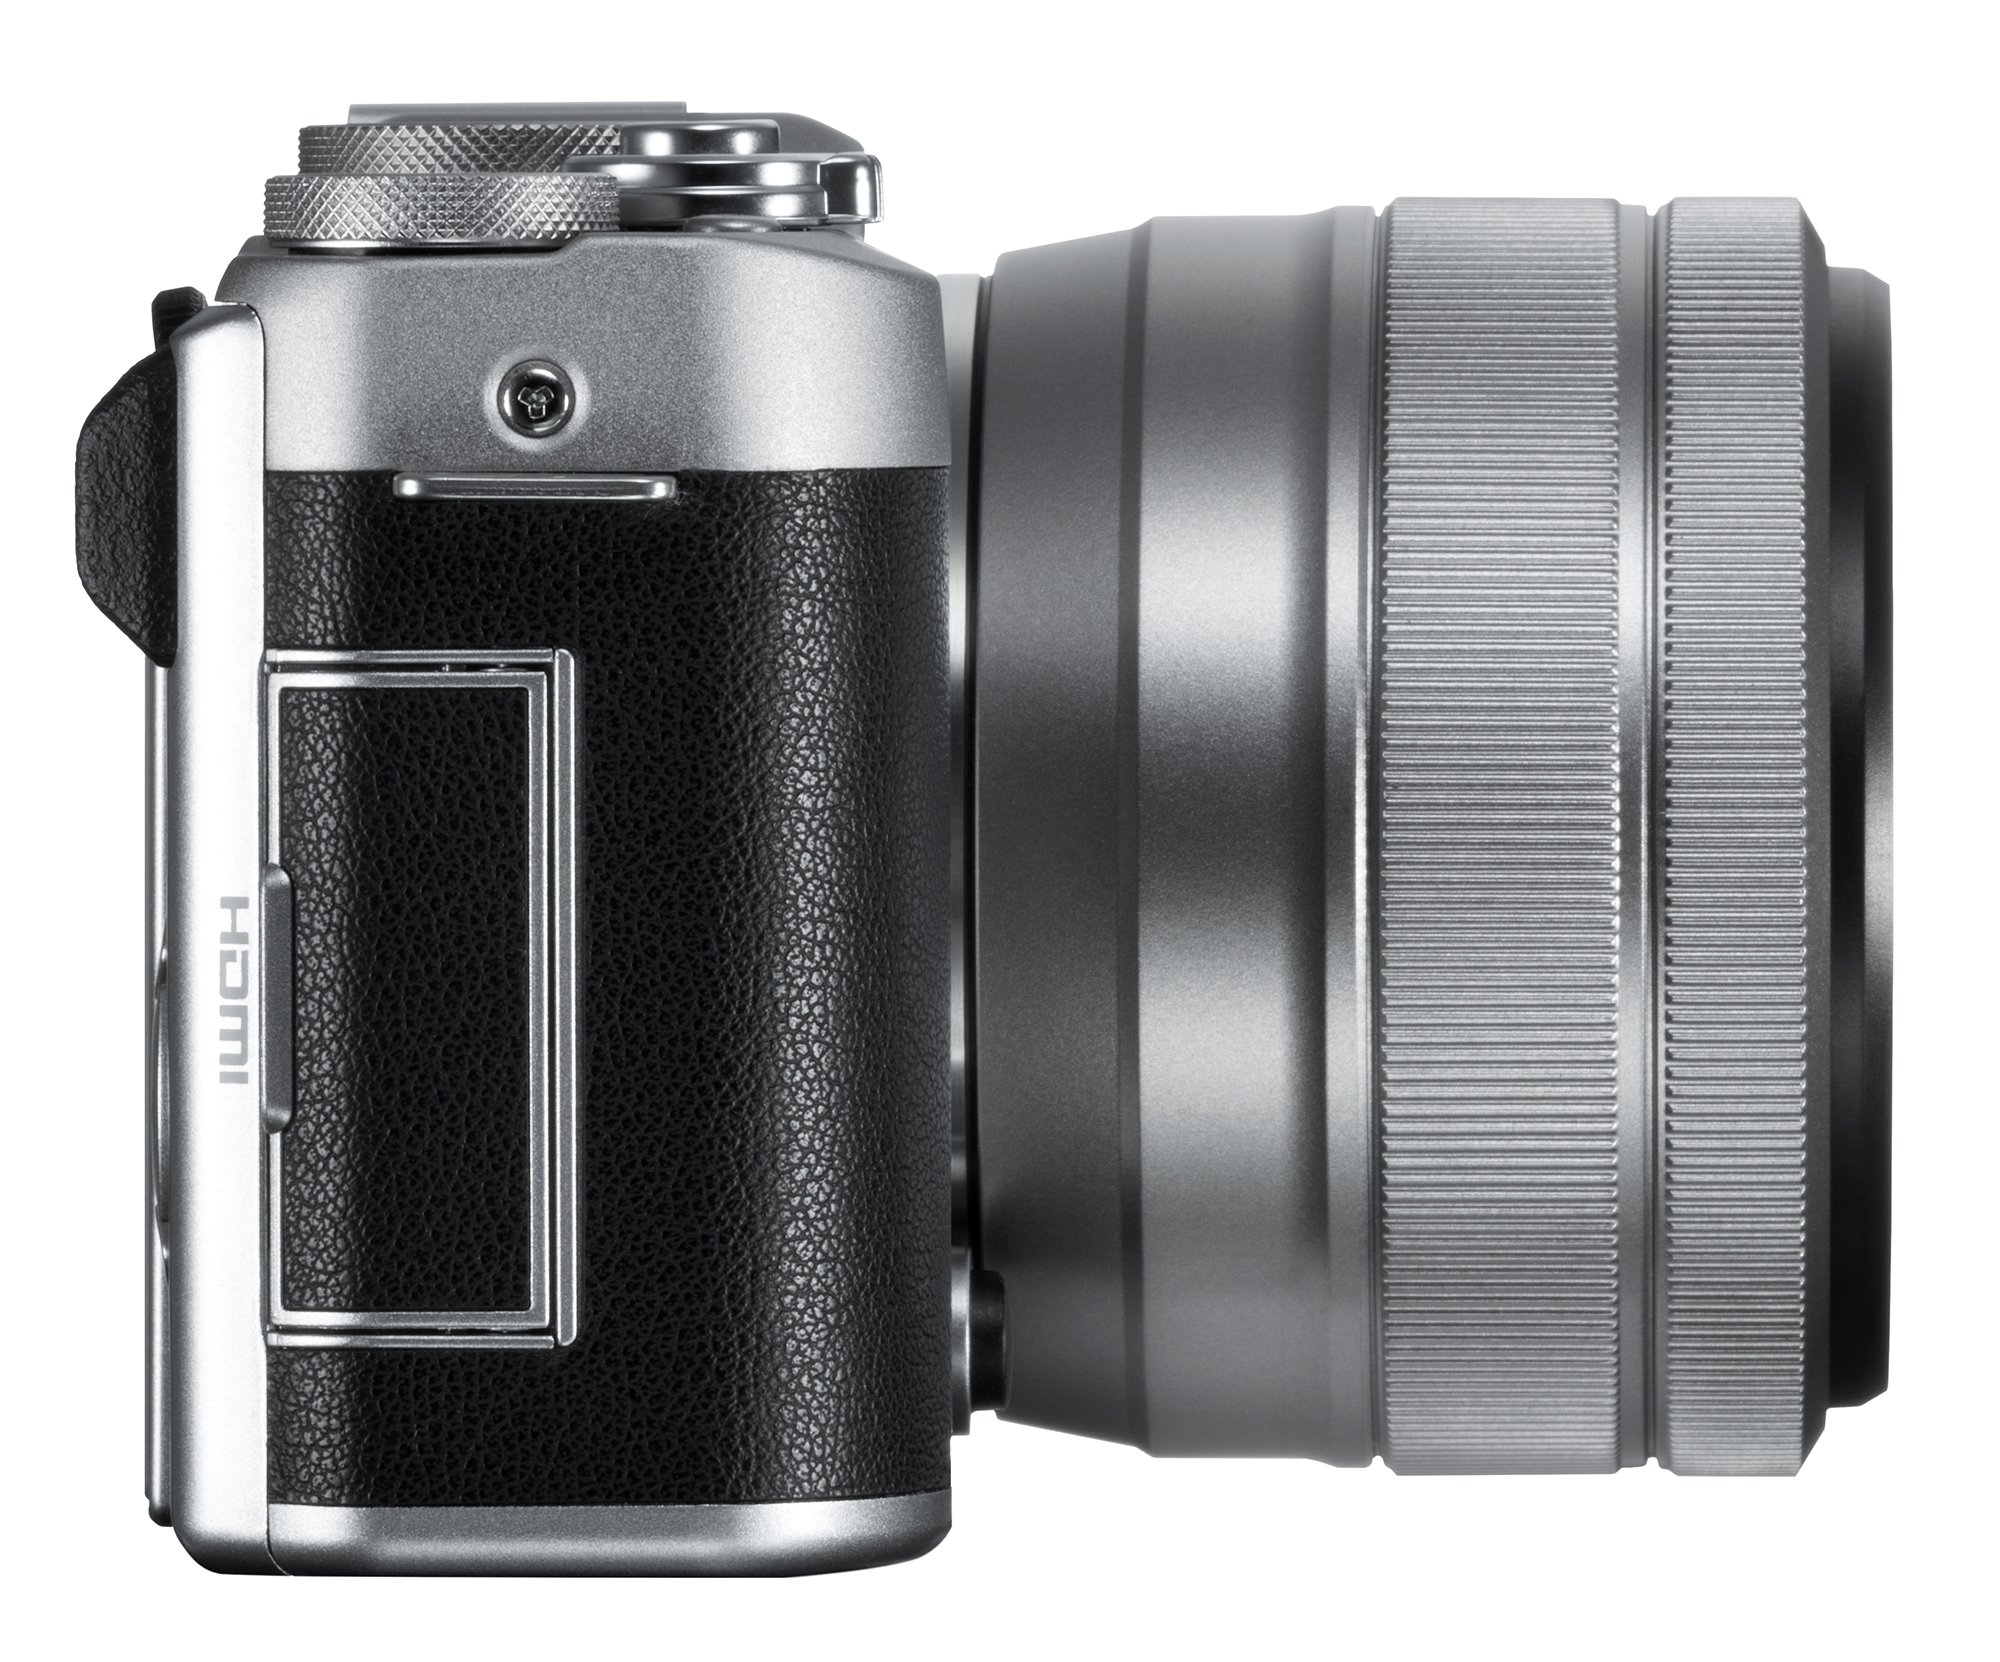 Fujifilm X-A5 Mirrorless Digital Camera w/XC15-45mmF3.5-5.6 OIS PZ Lens - Silver by Fujifilm (Image #9)